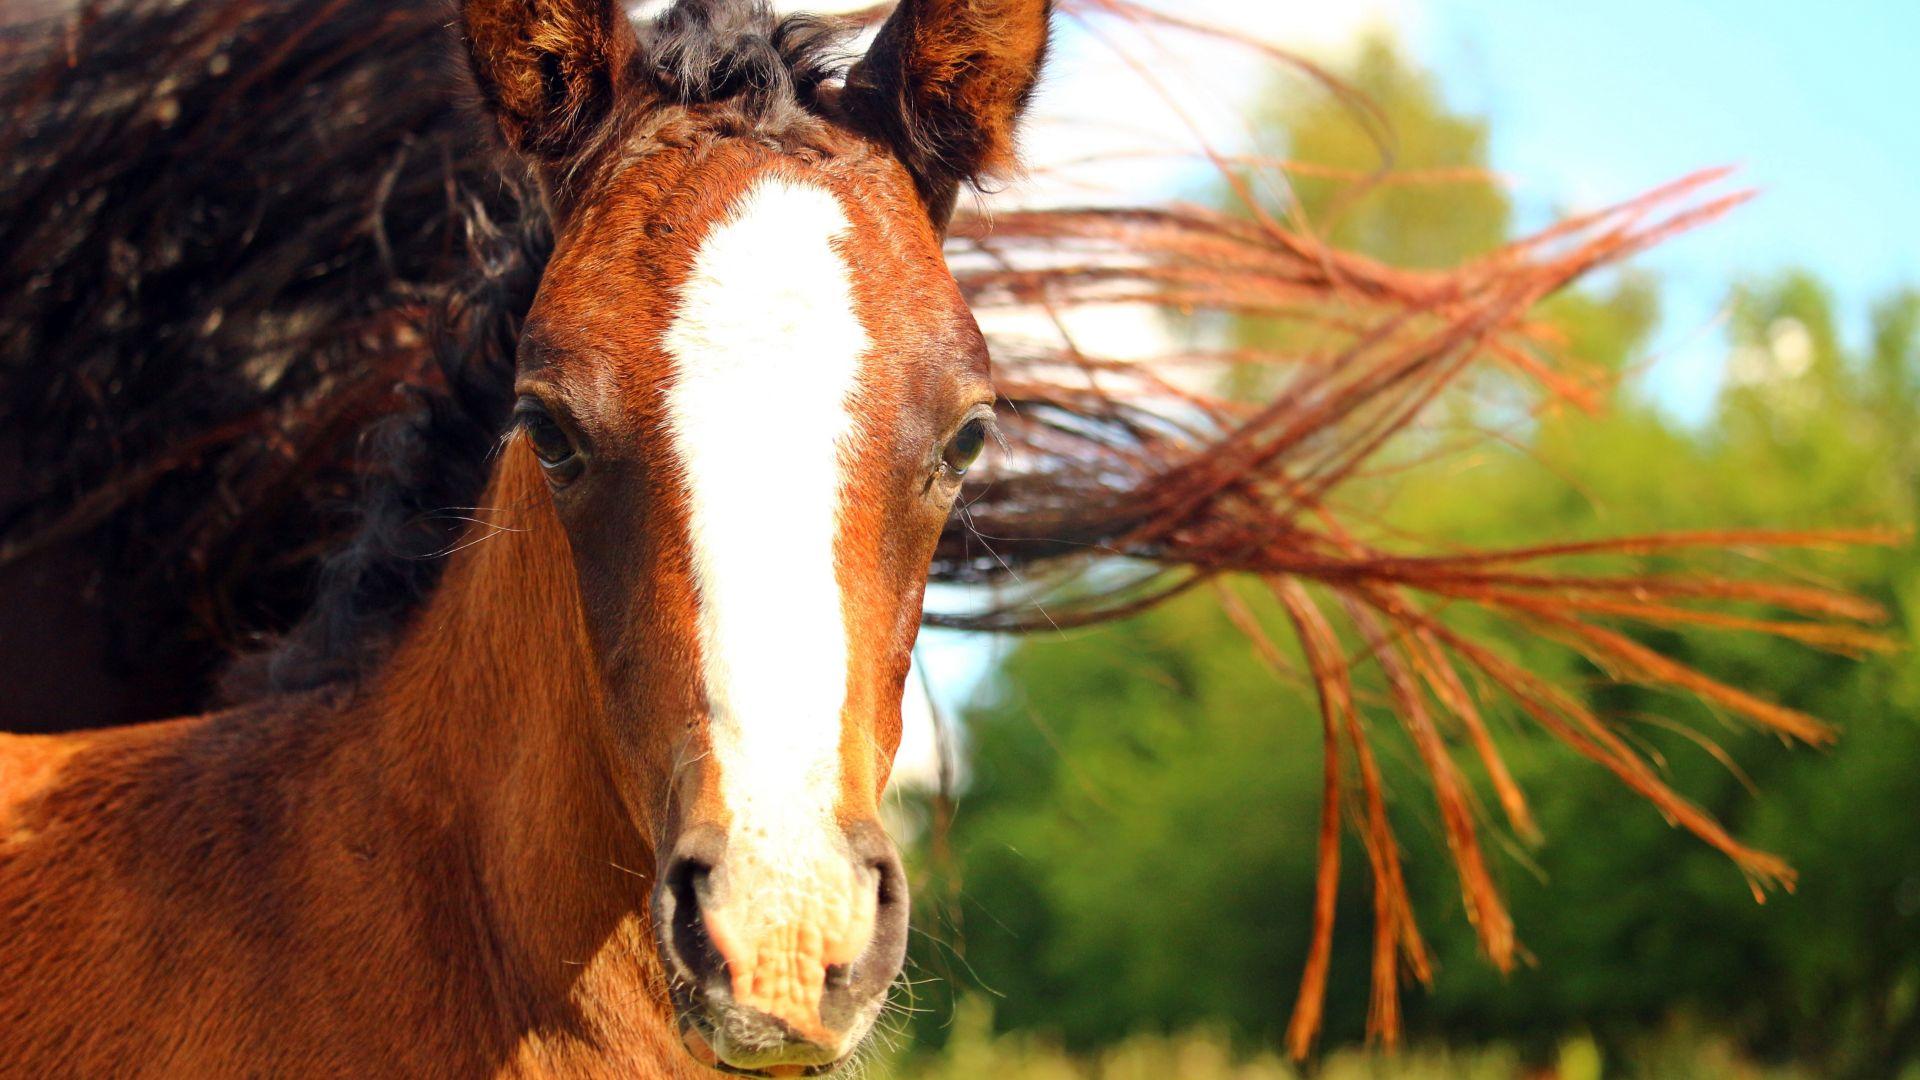 Brown horse, head, muzzle, animal